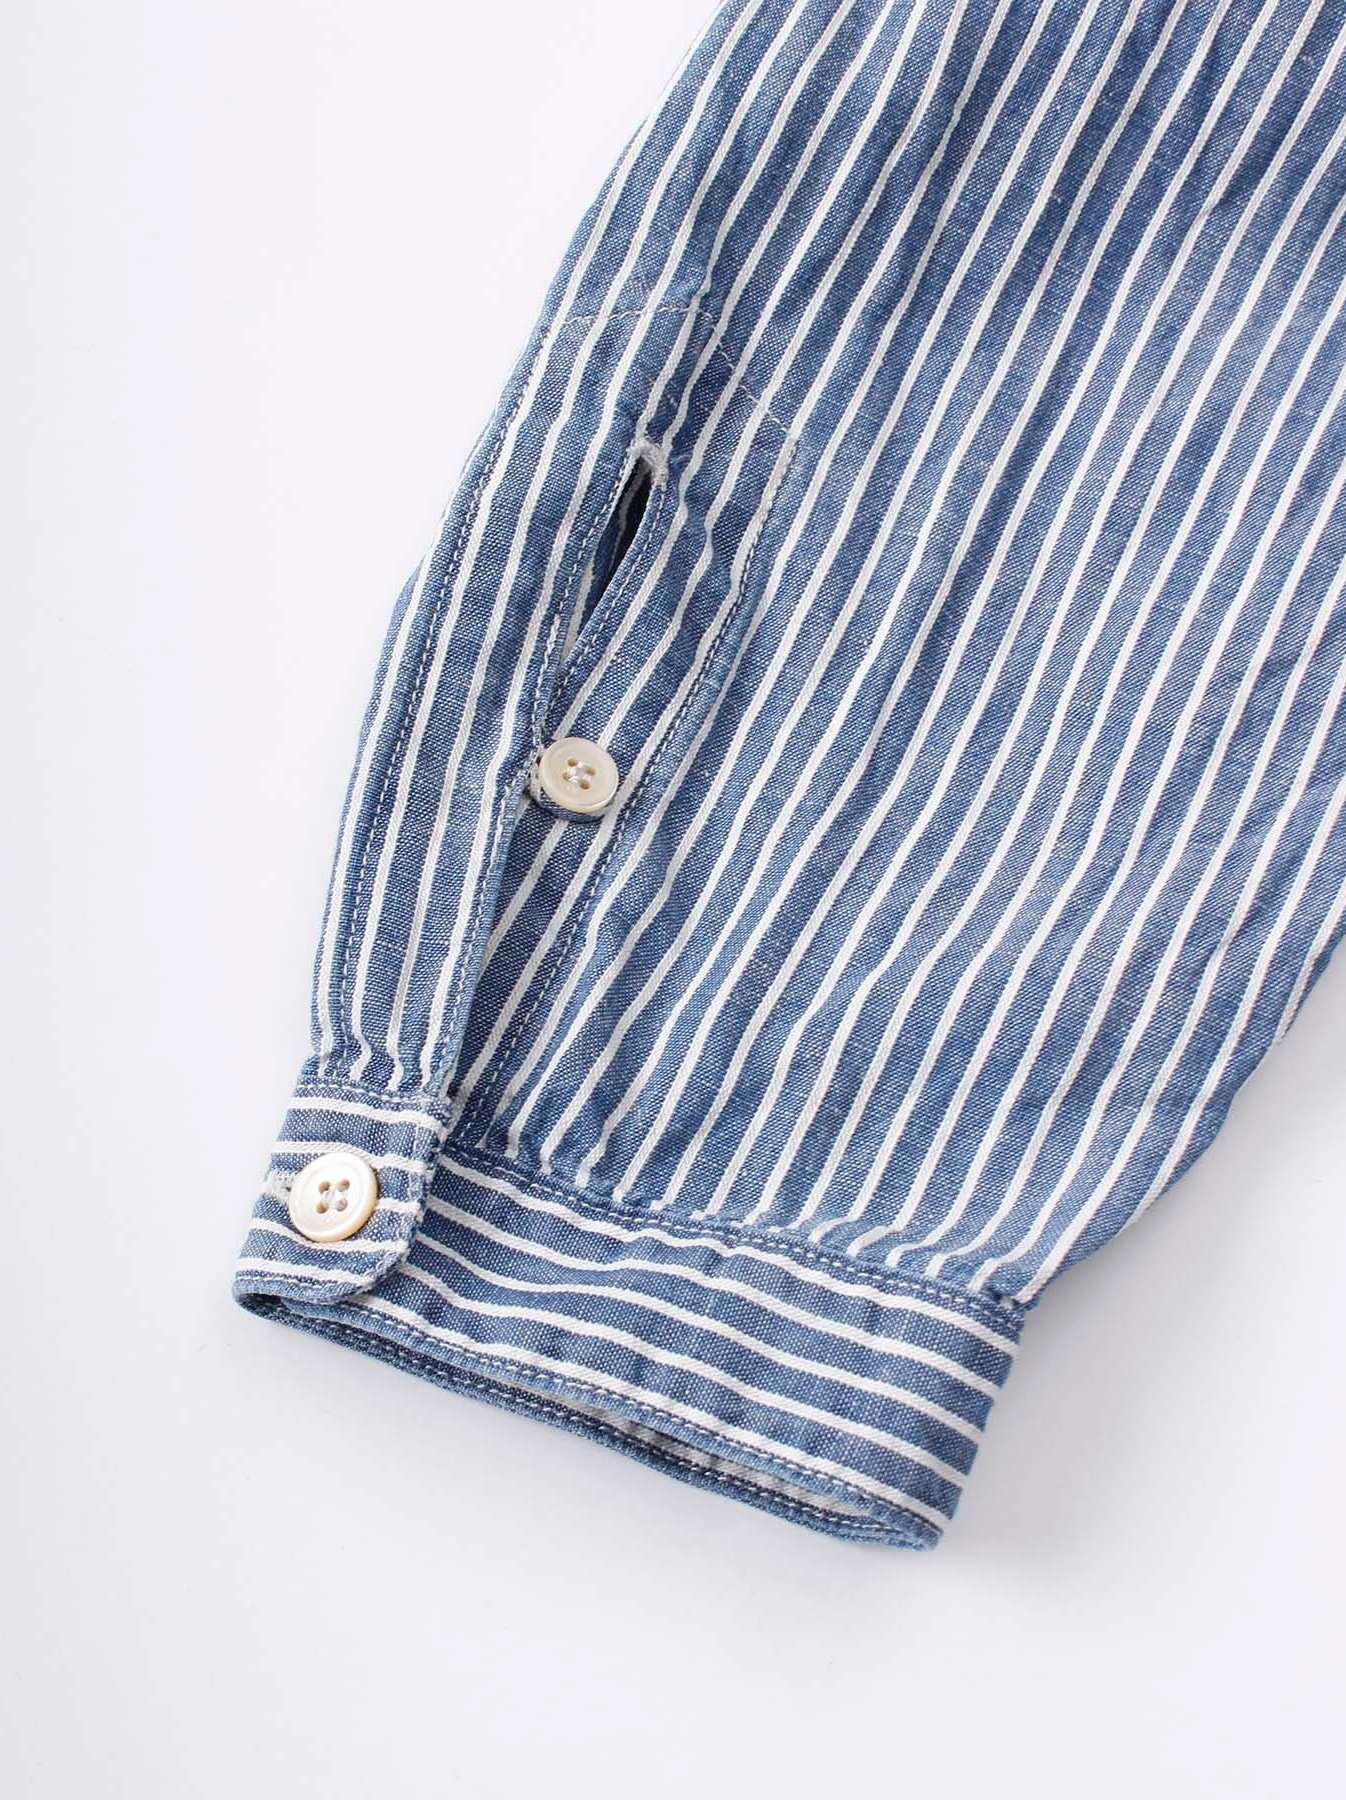 WH Cotton Linen Hickory Umahiko Pullover Shirt-9